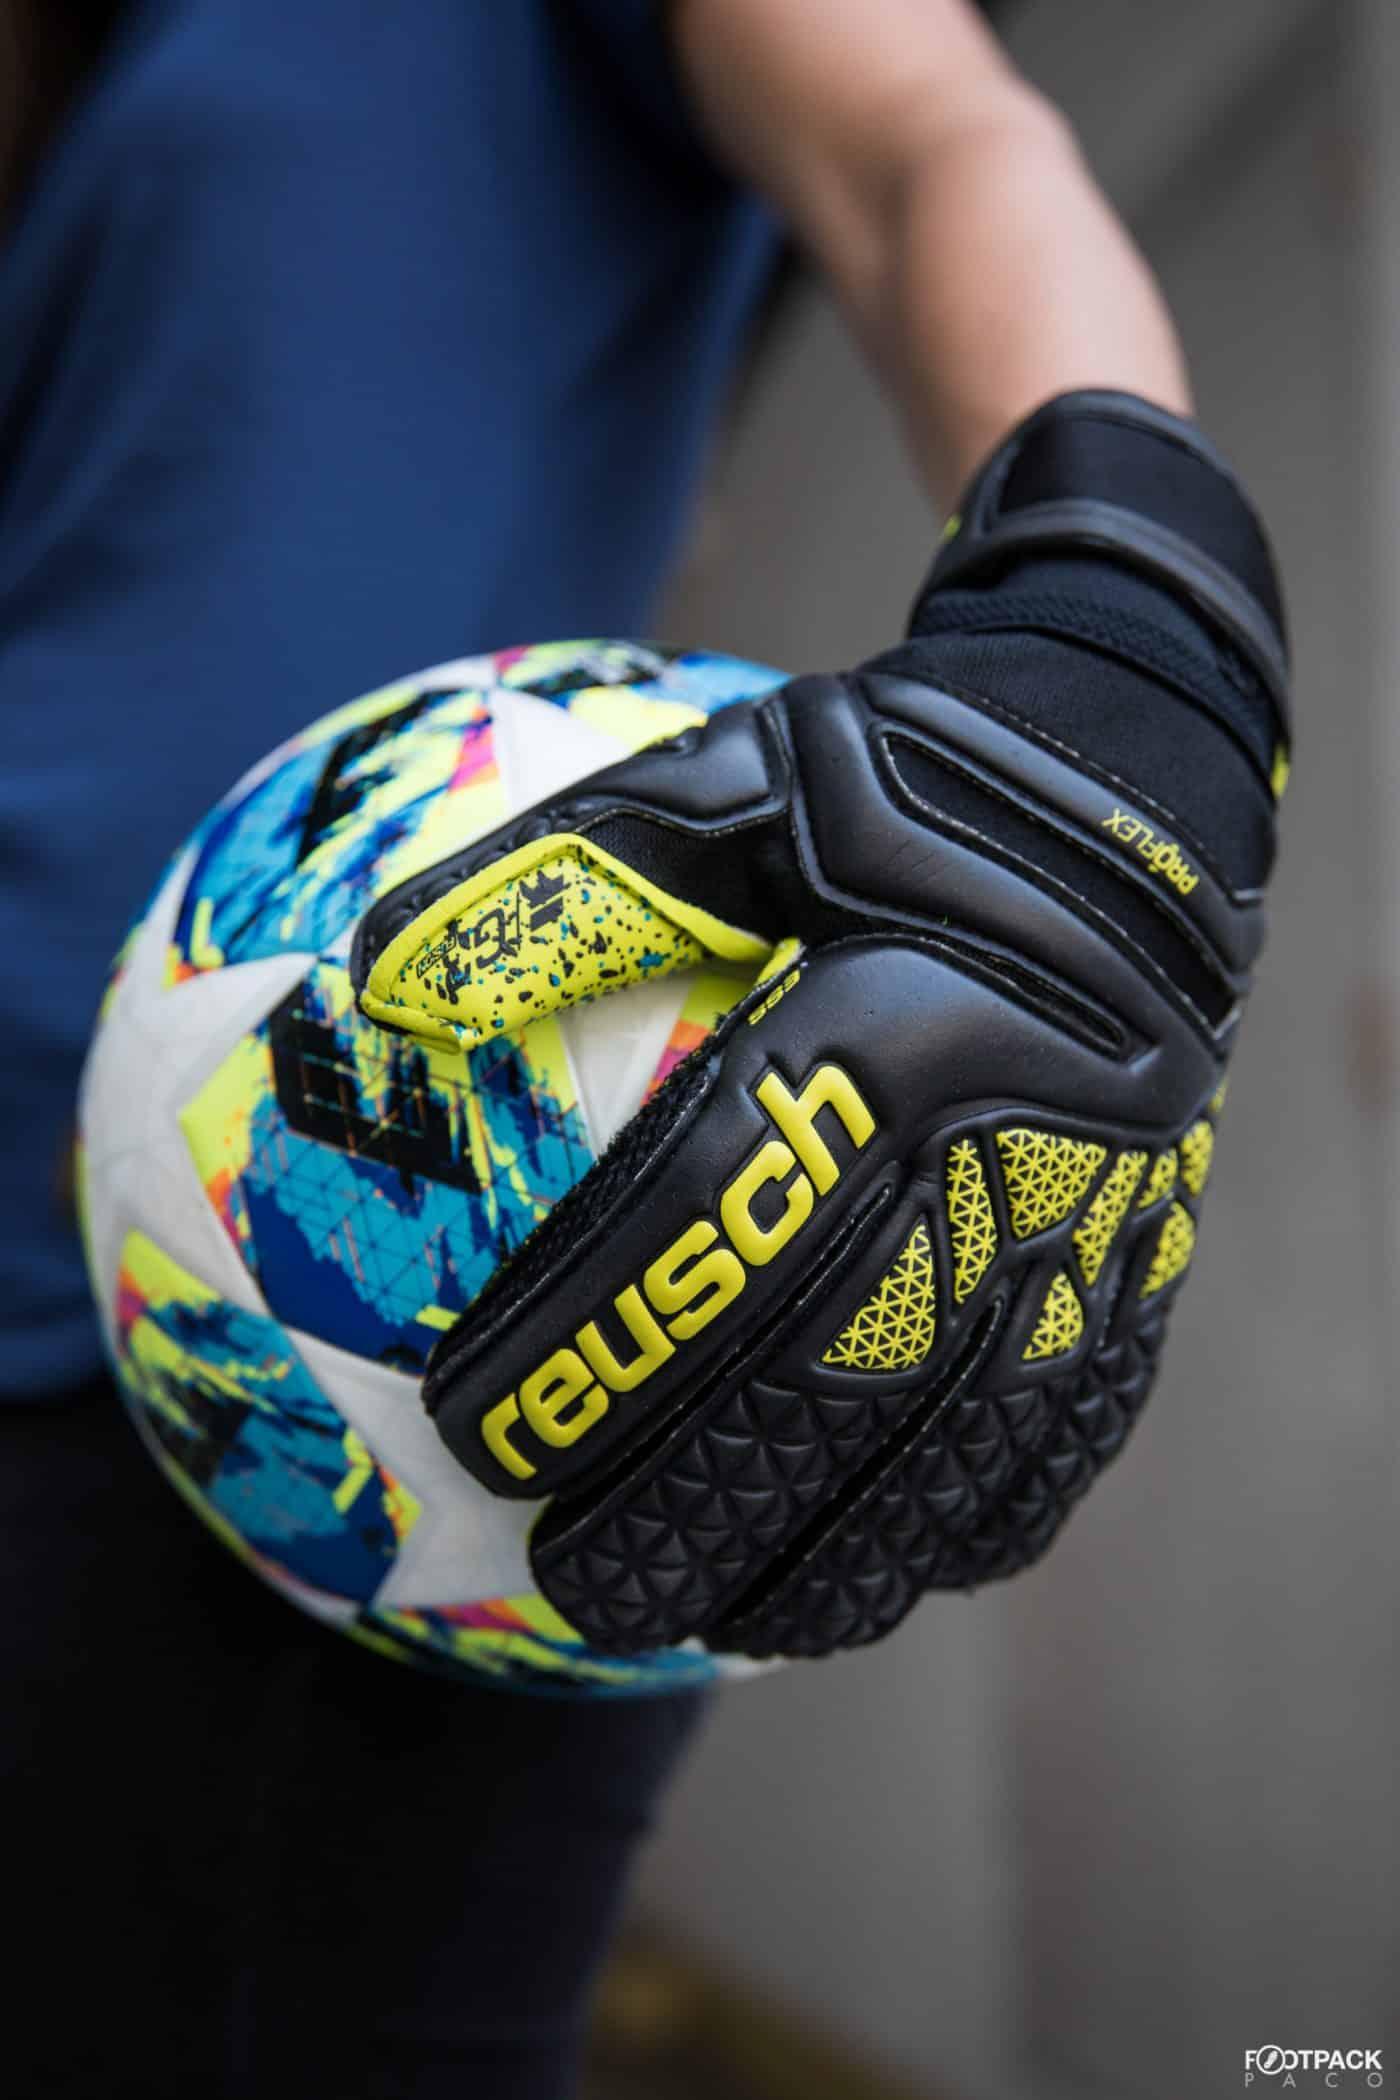 gant-reusch-fit-Control-Pro-G3-Fusion-HL-hugo-lloris-footpack-4